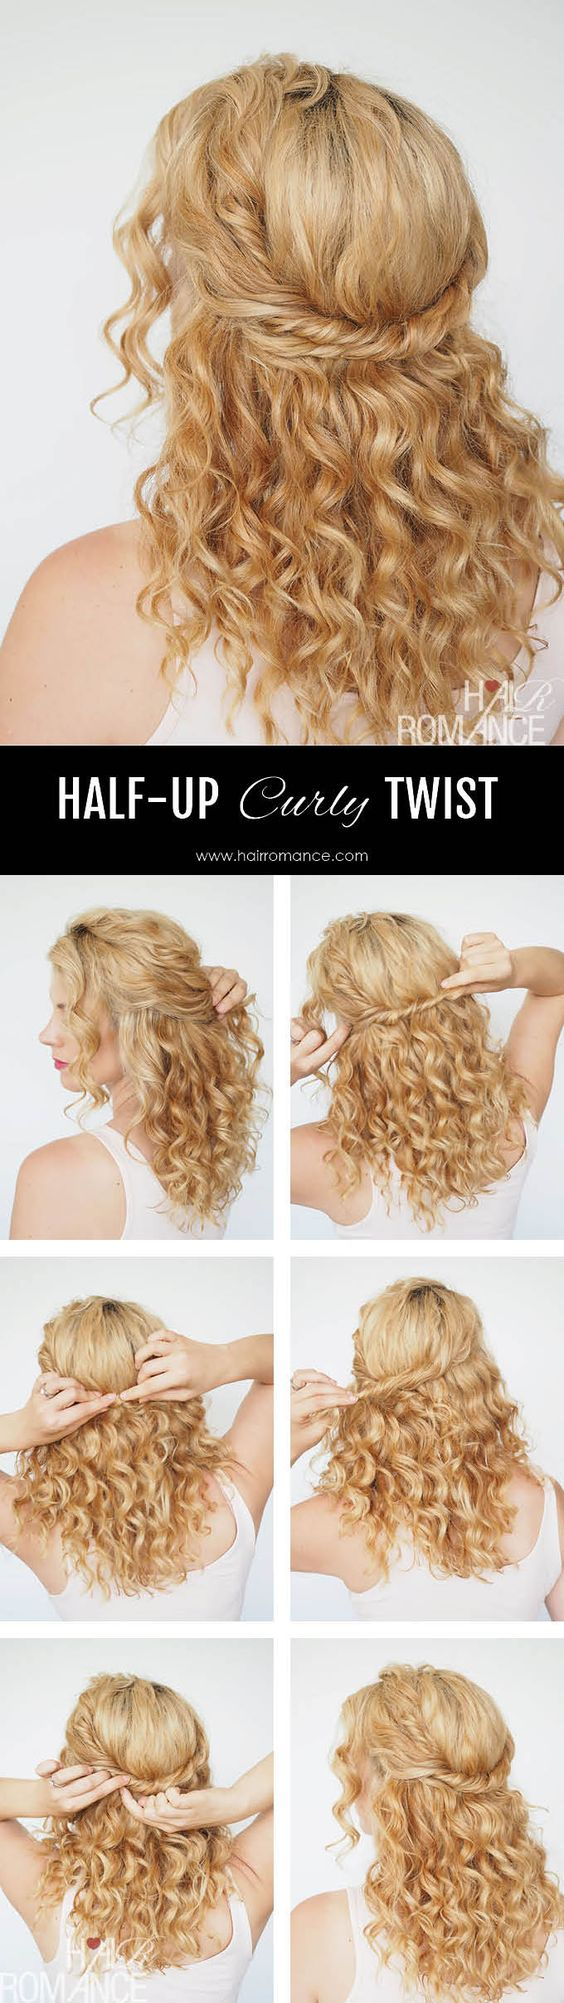 Chic and simple half-up twist tutorial (Hair Romance)